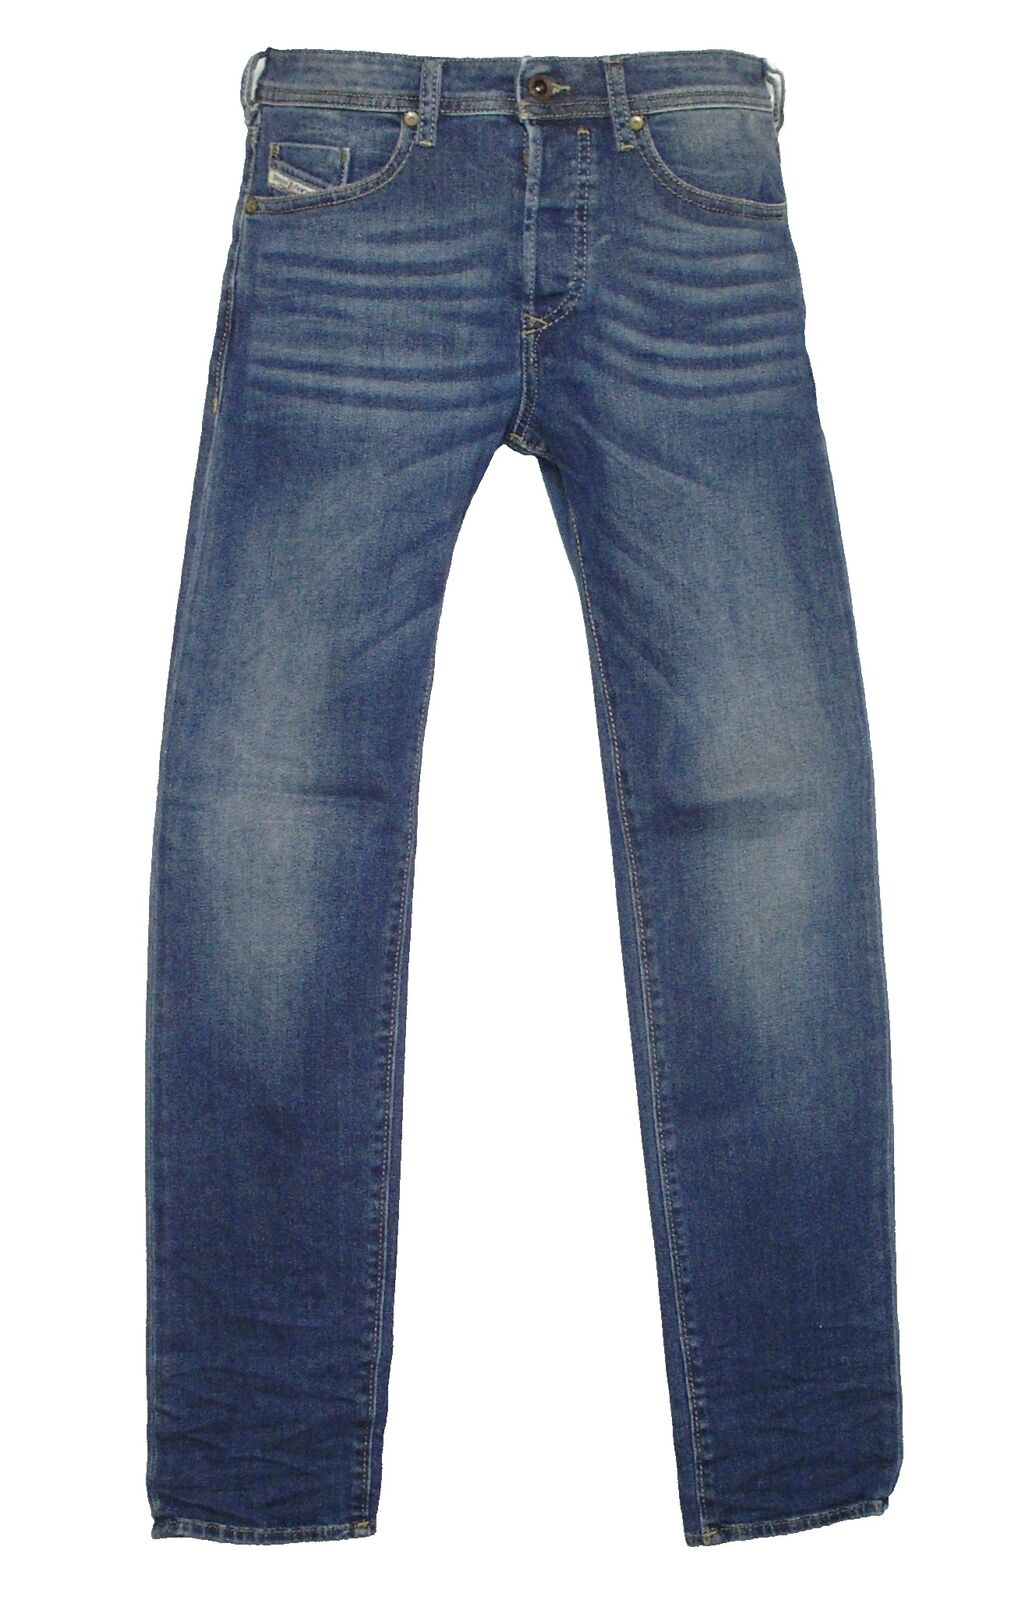 DIESEL Uomo Jeans Stretch Buster 0837i blu colorei attenuati Slim Tg. 29 32 NUOVO